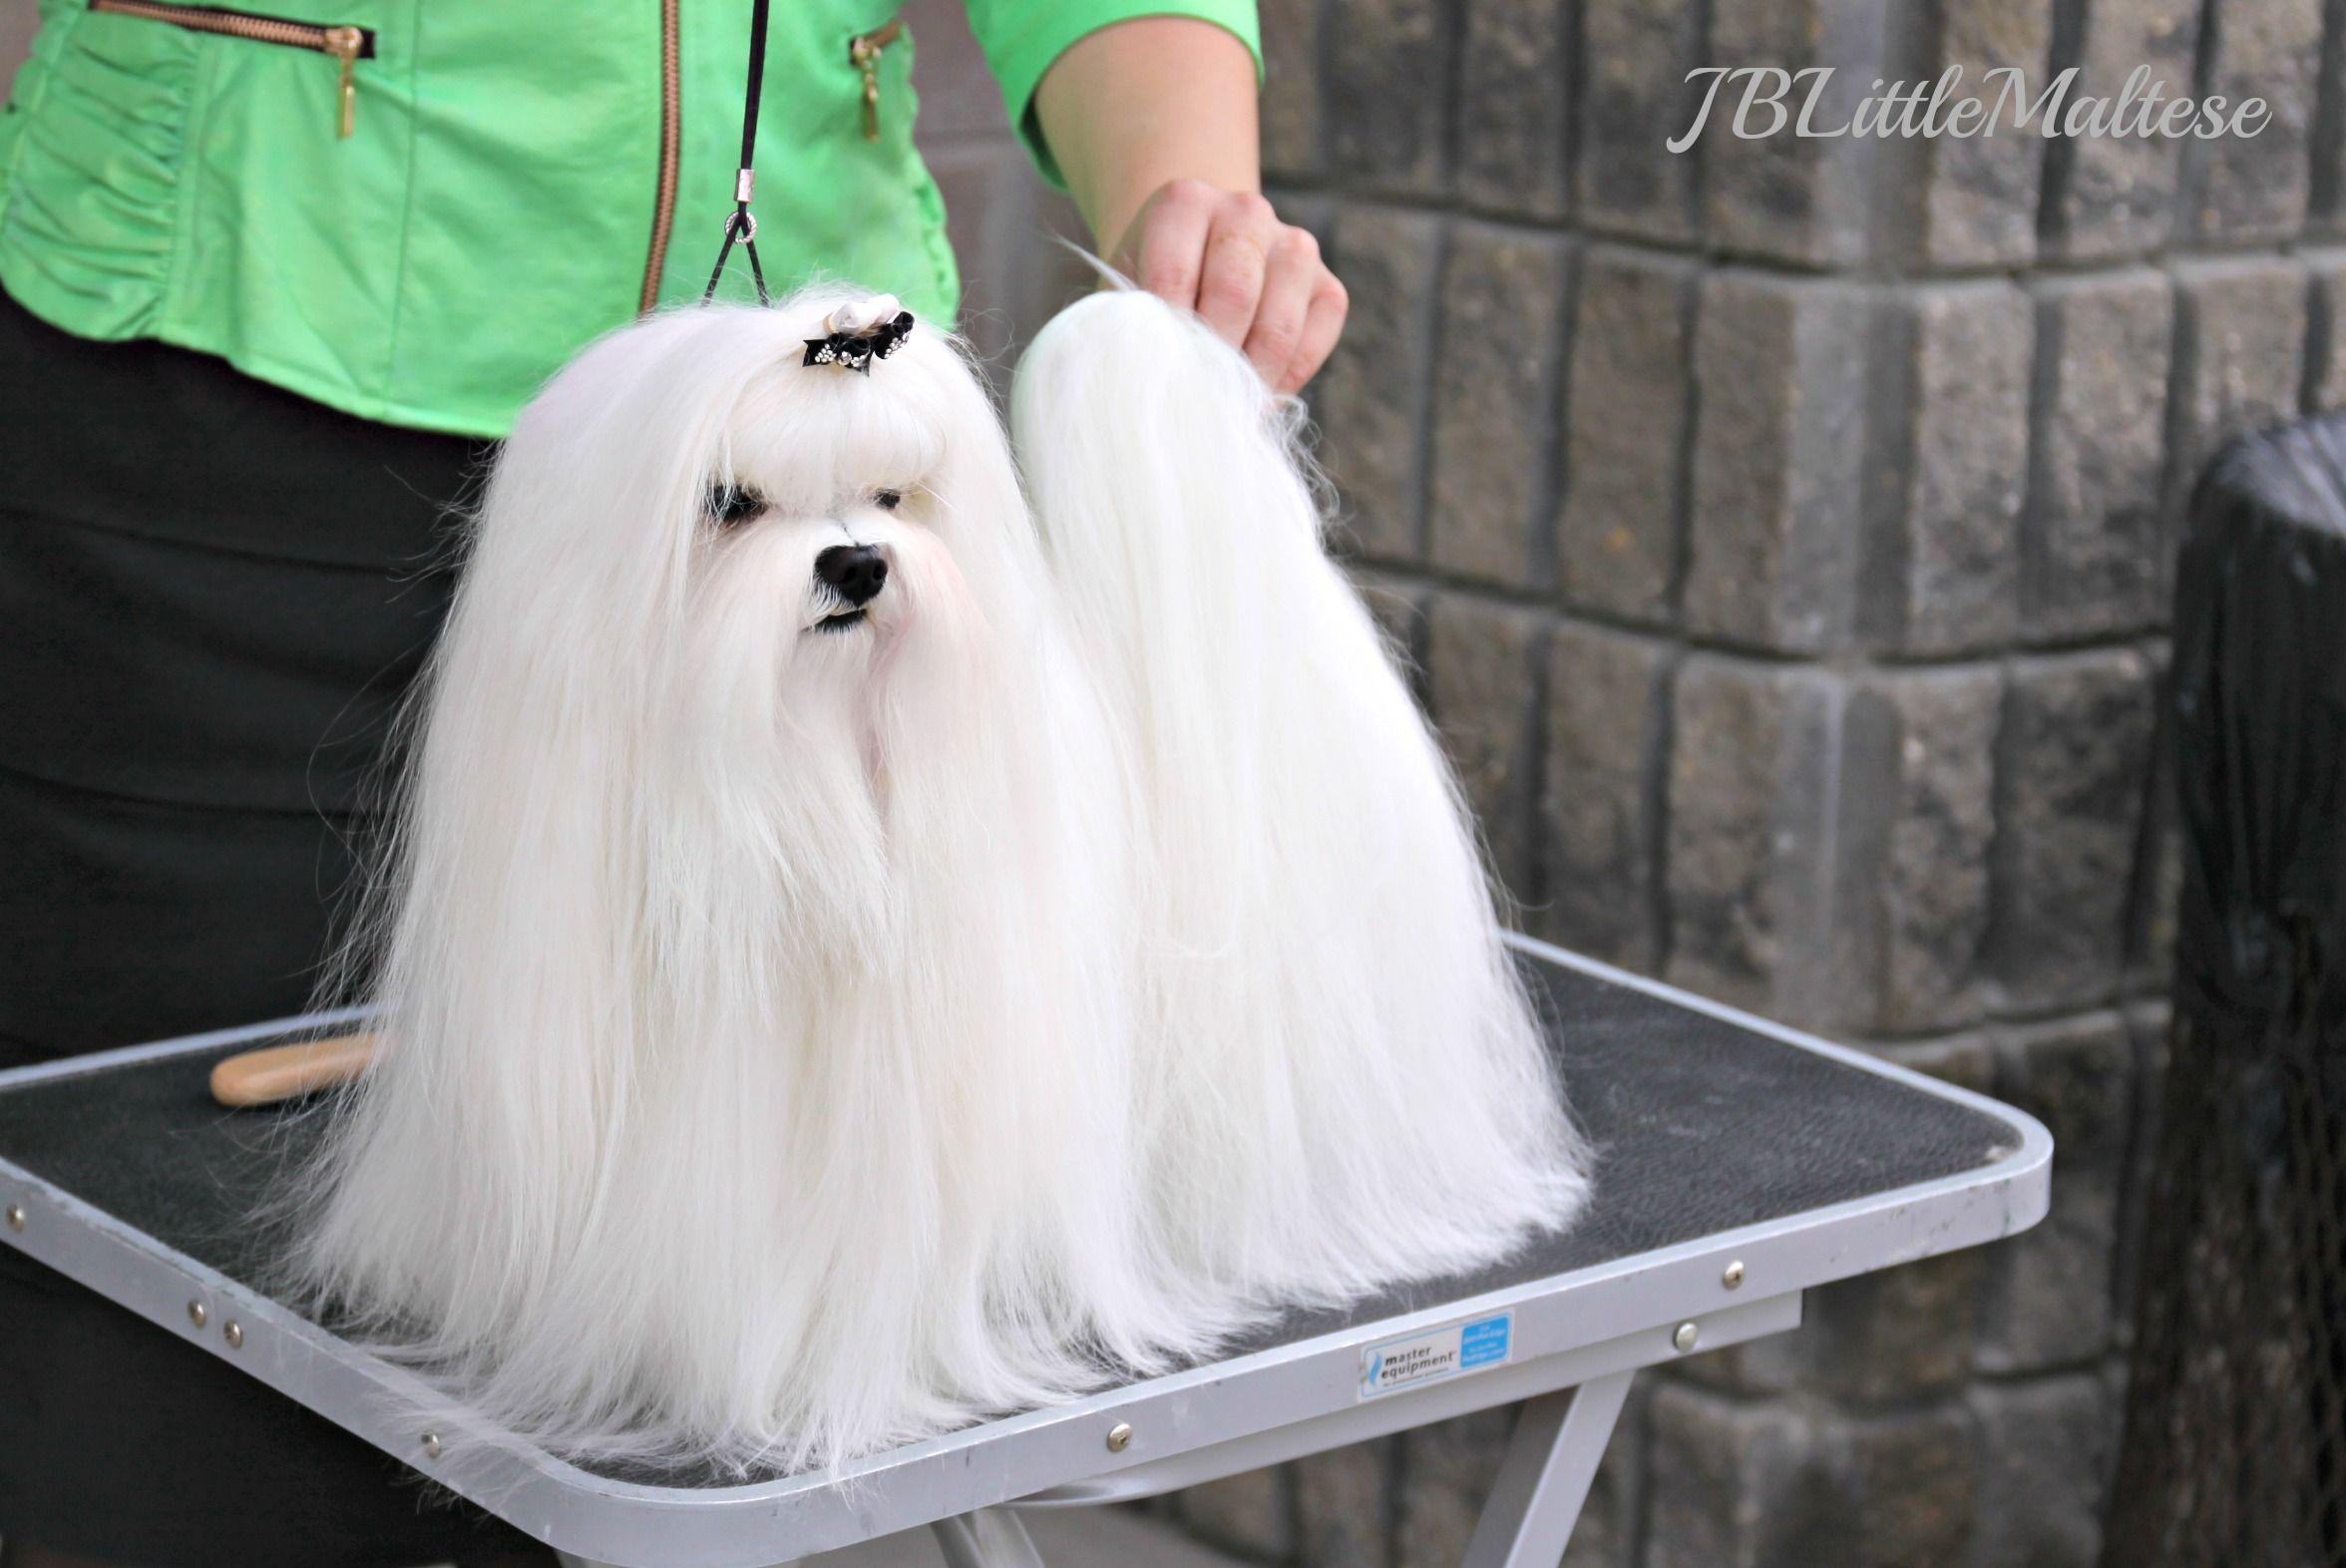 Canadian Grand Champion Jblittle Amigo S Bandito Is A Top Show Dog